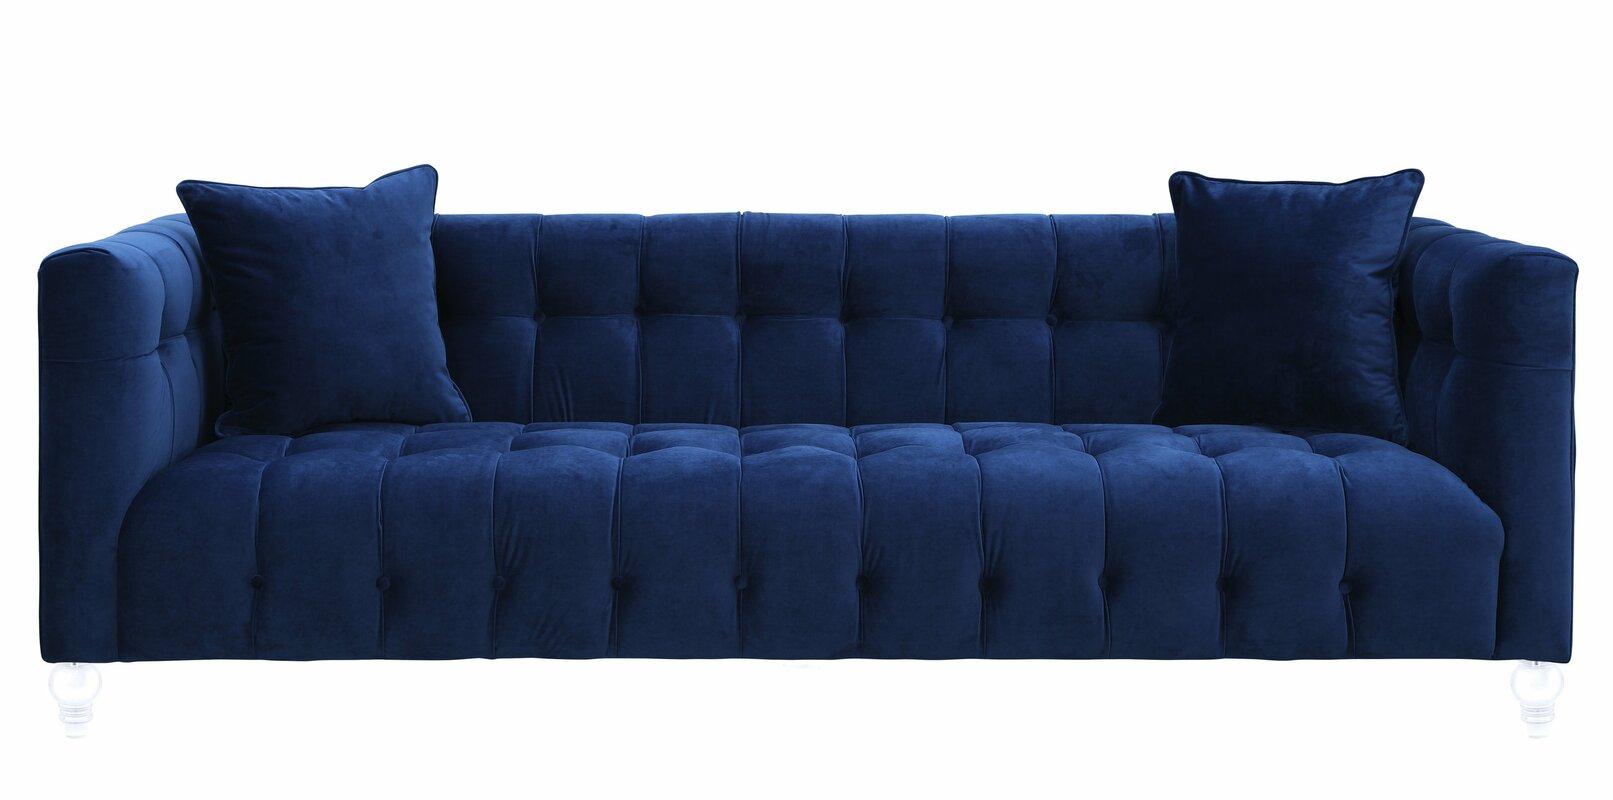 Chesterfield Sofas mercer41 kittrell chesterfield sofa reviews wayfair